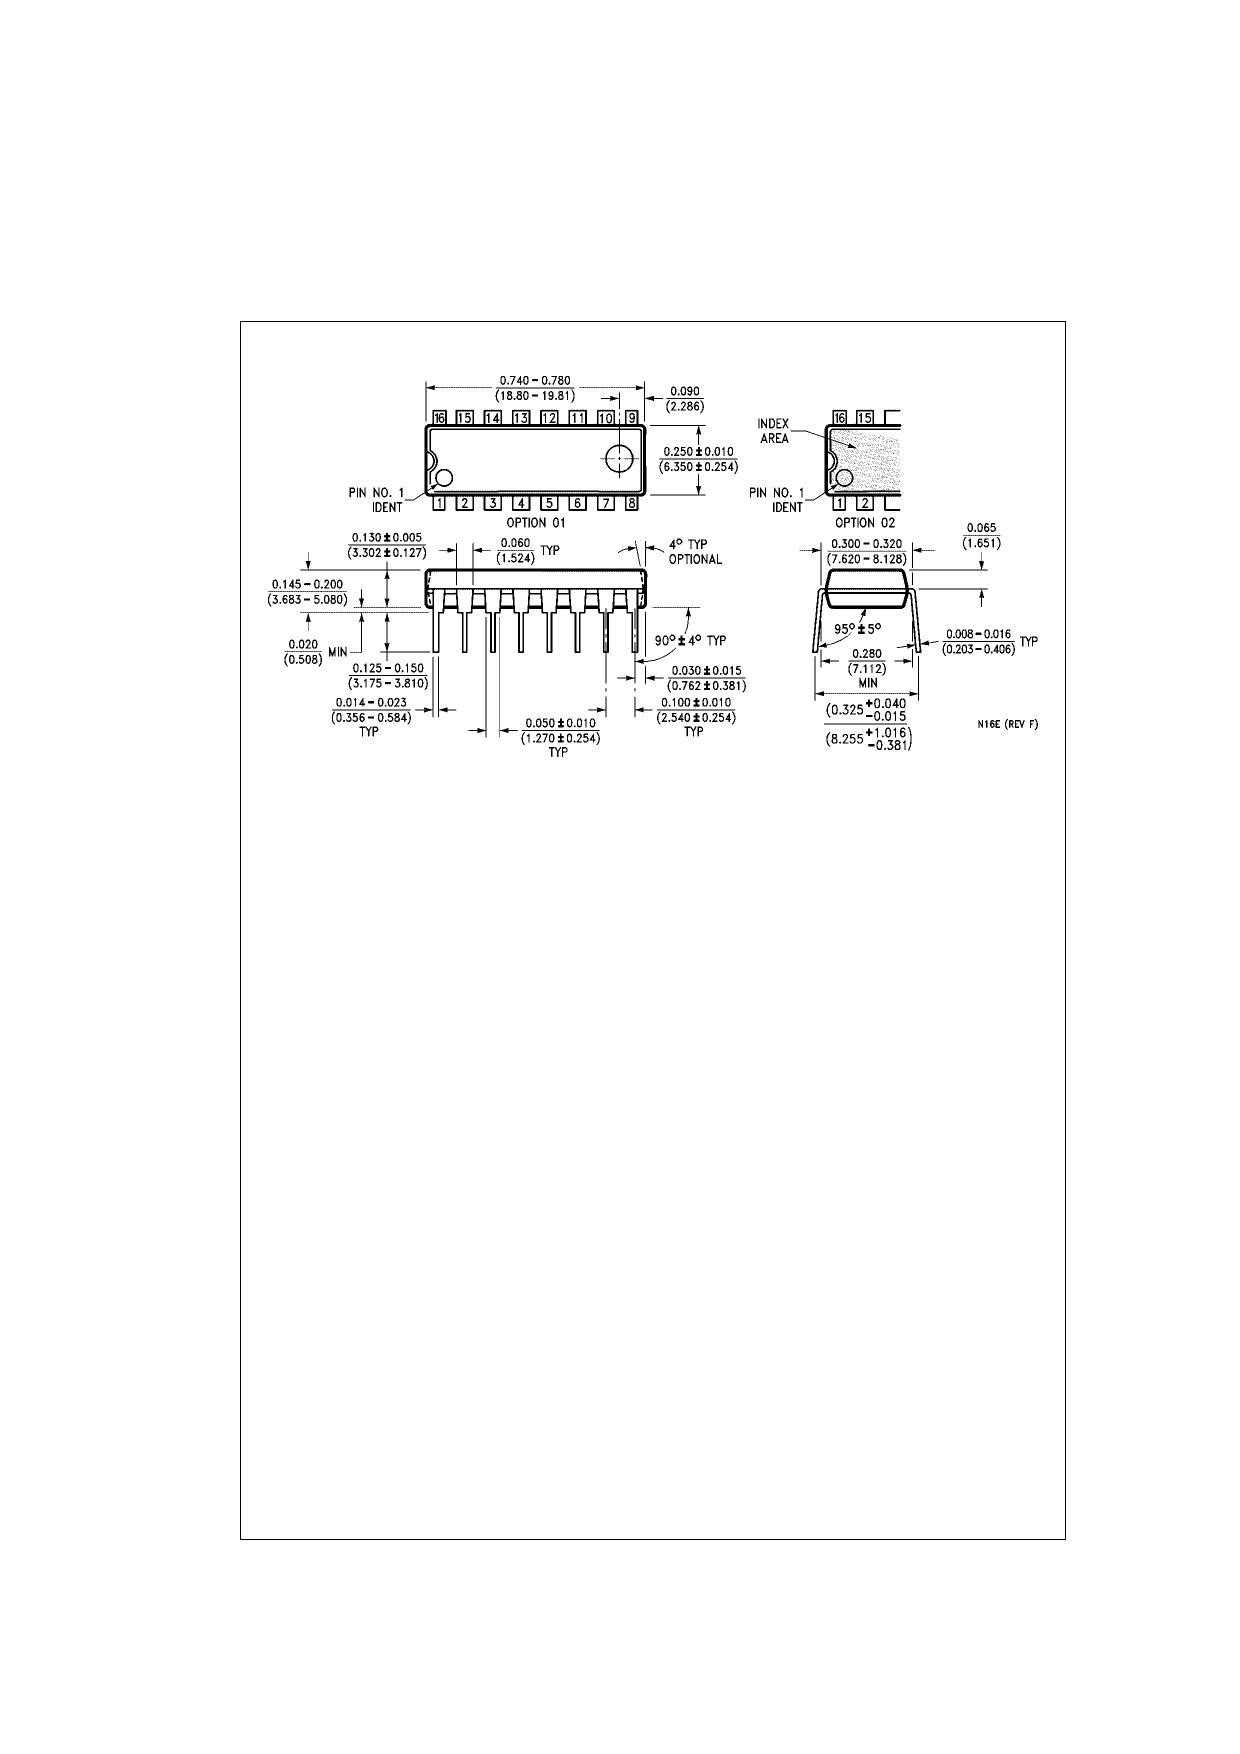 74S253 pdf, 전자부품, 반도체, 판매, 대치품